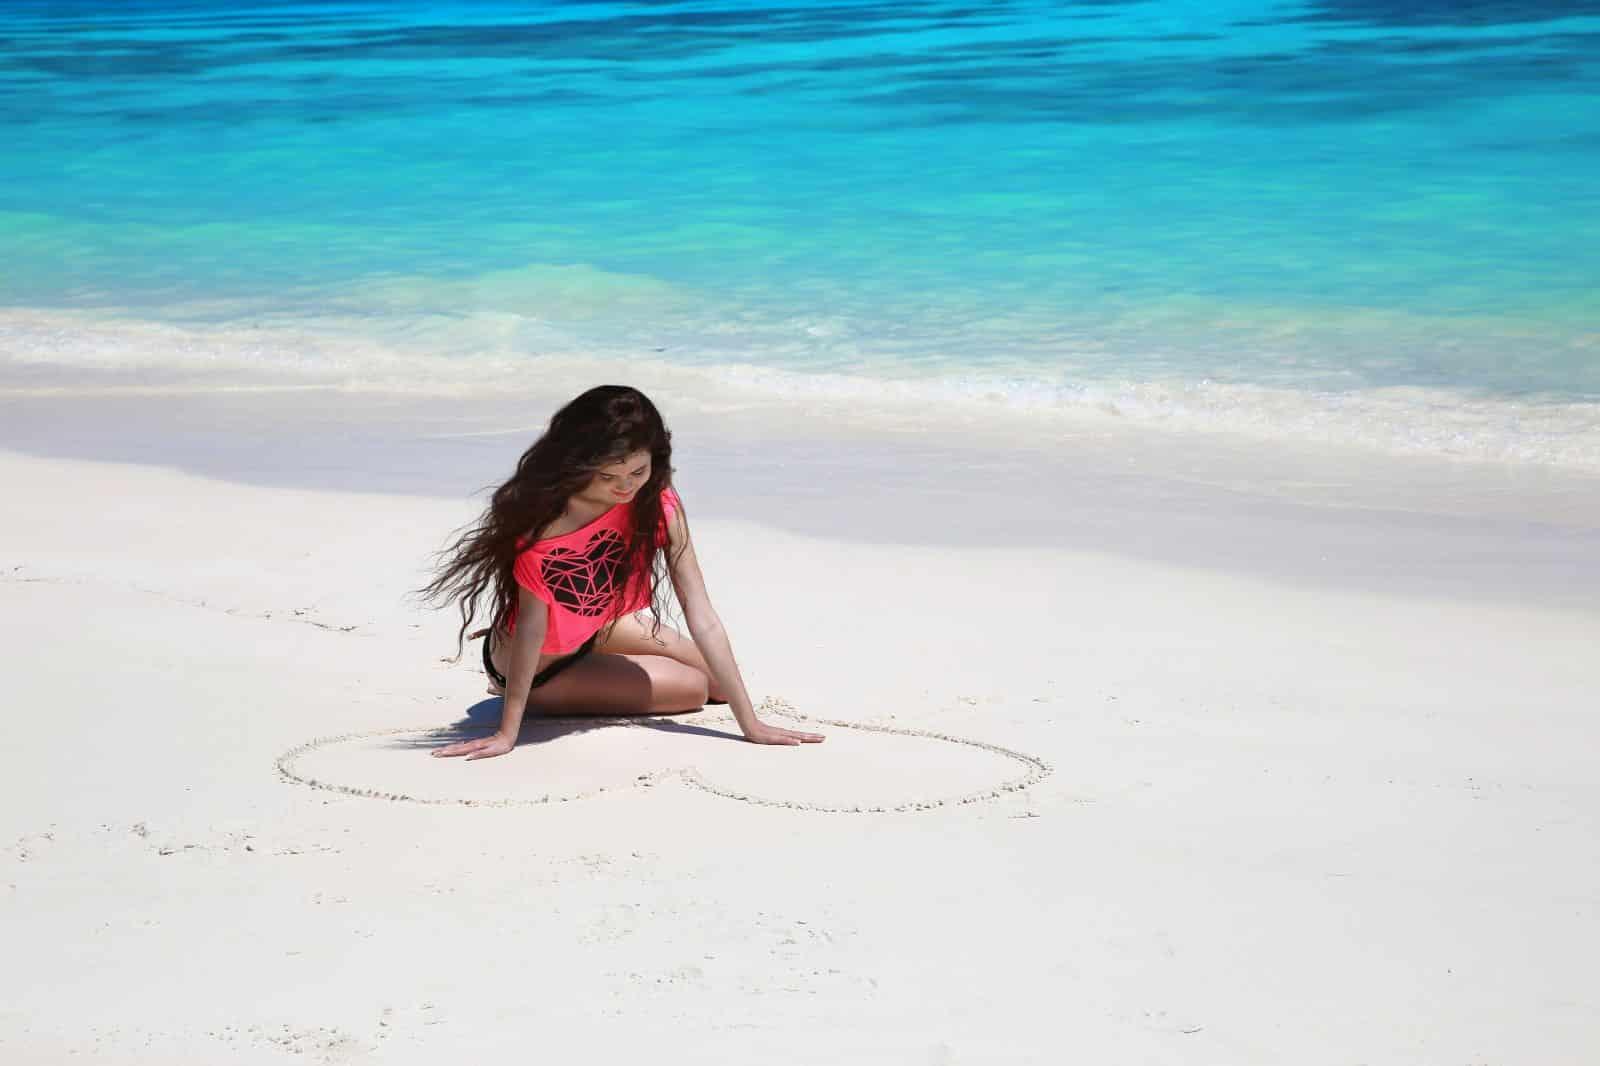 Vrouw op strand tekent hart in zand